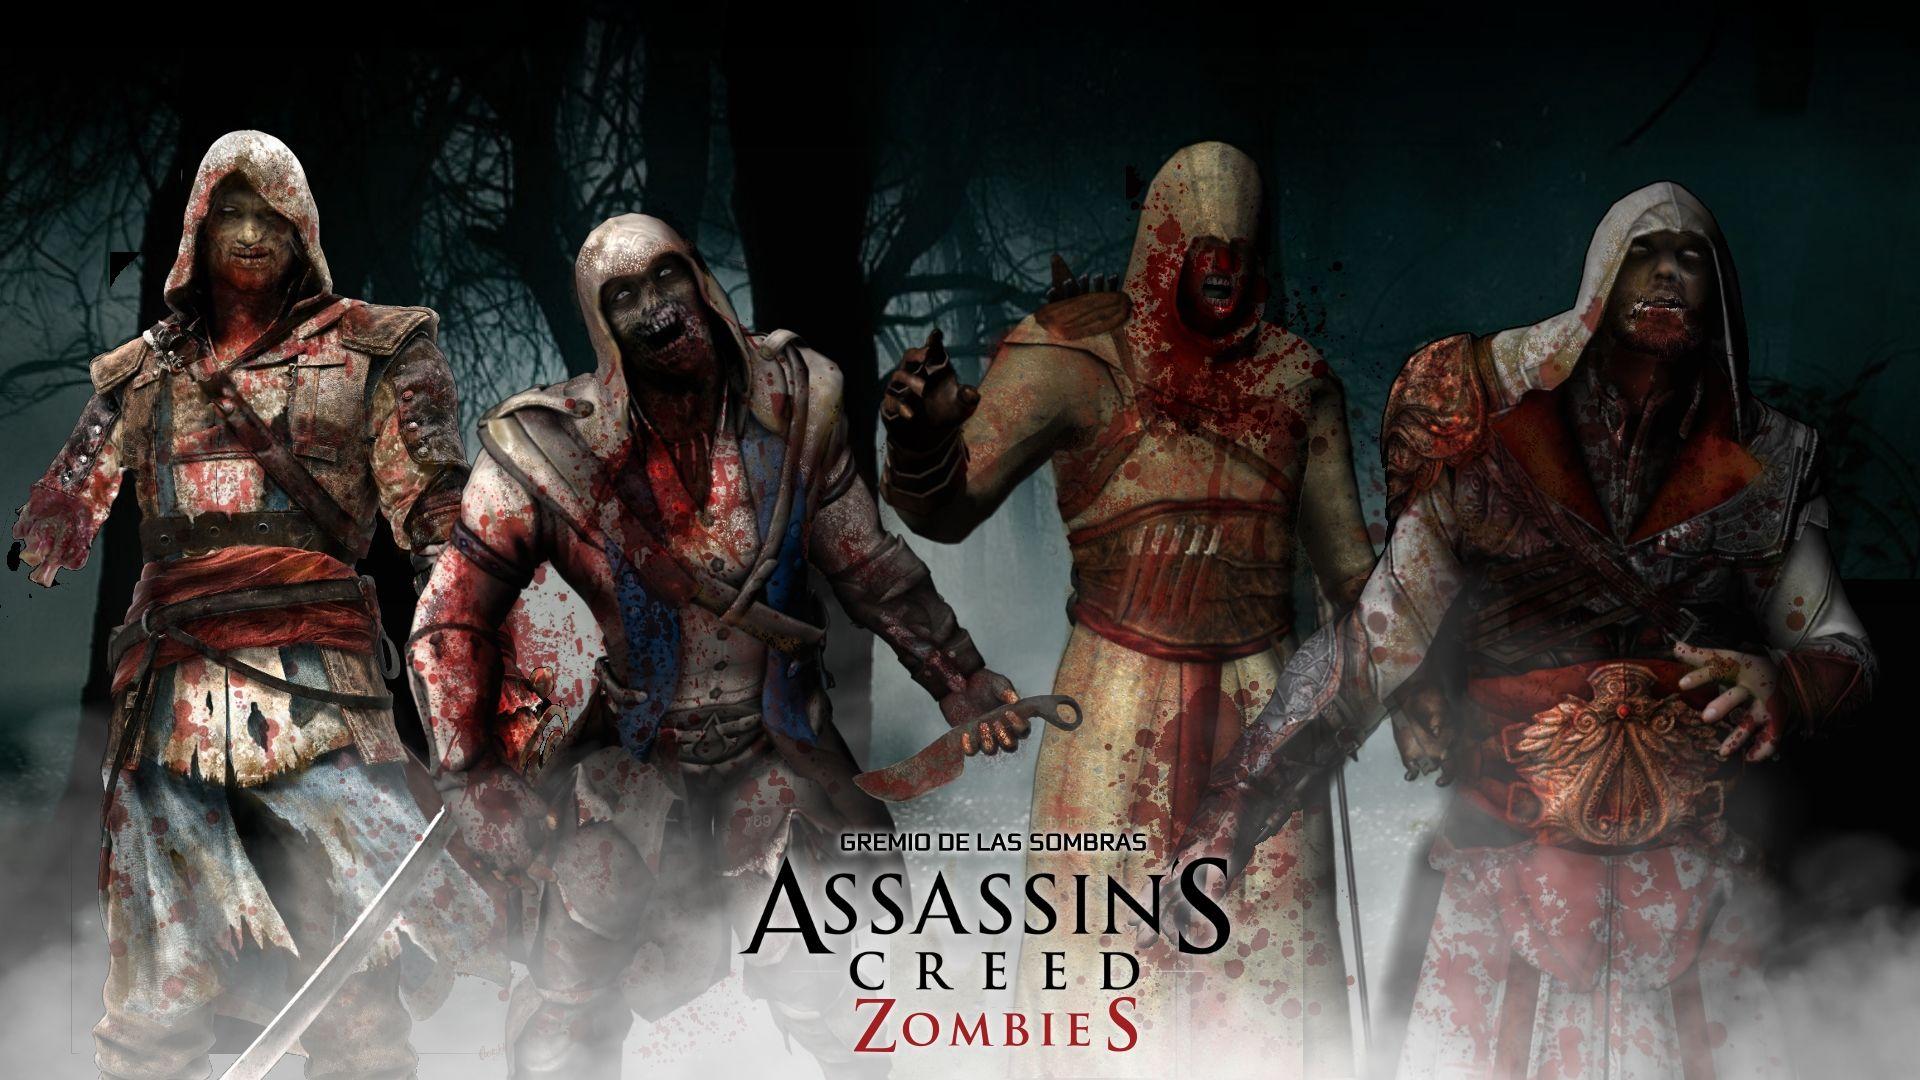 Assassin S Creed Zombies Nooooooooo They Will Never Die